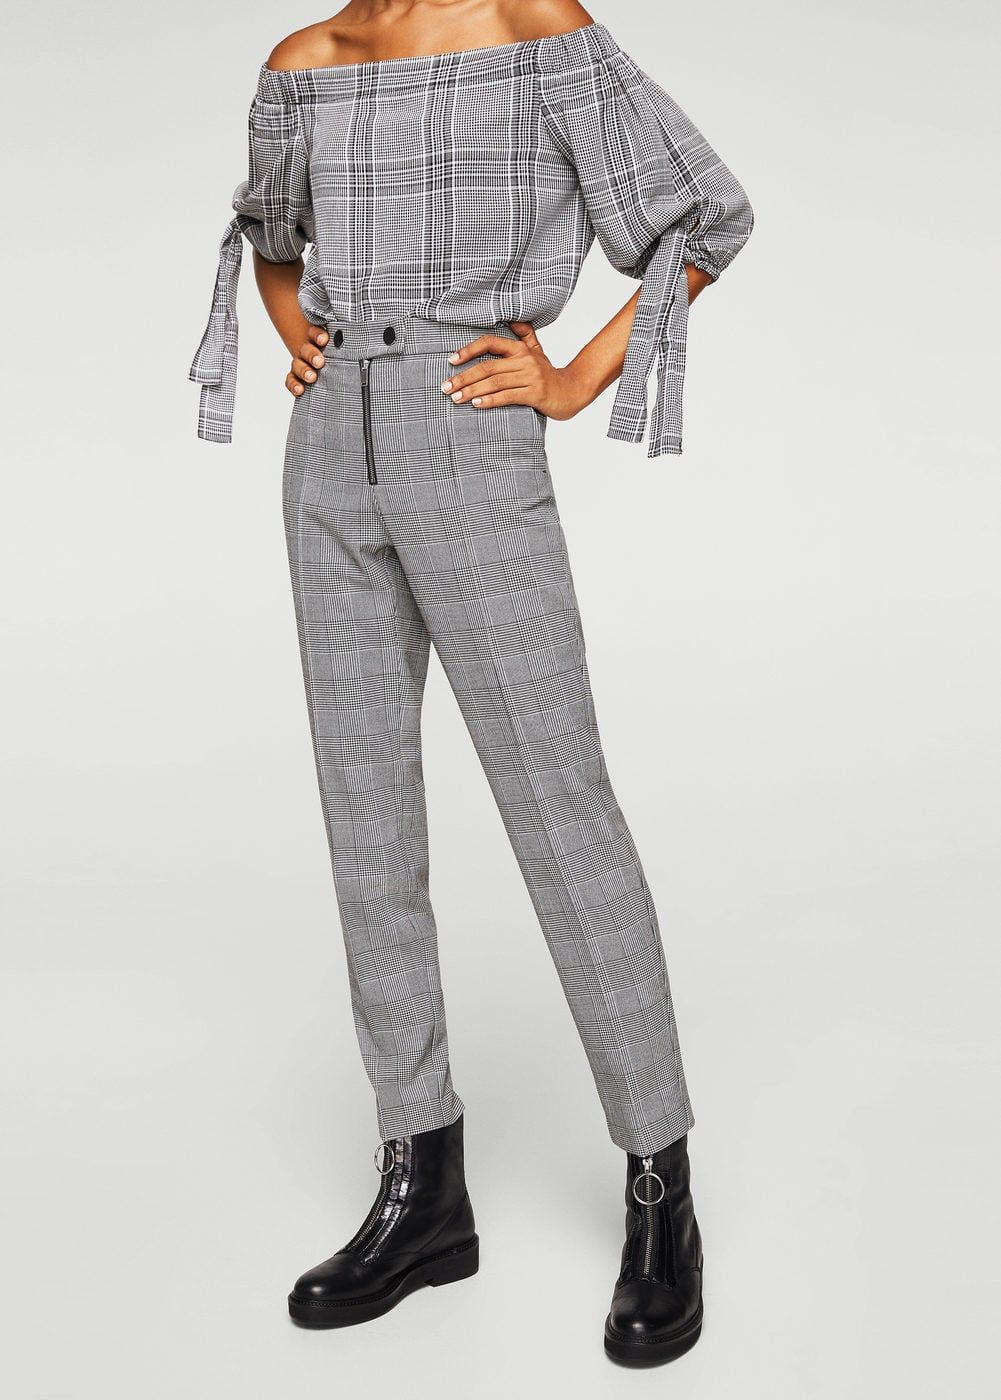 Prince of wales trousers - Woman  8620aeebb91